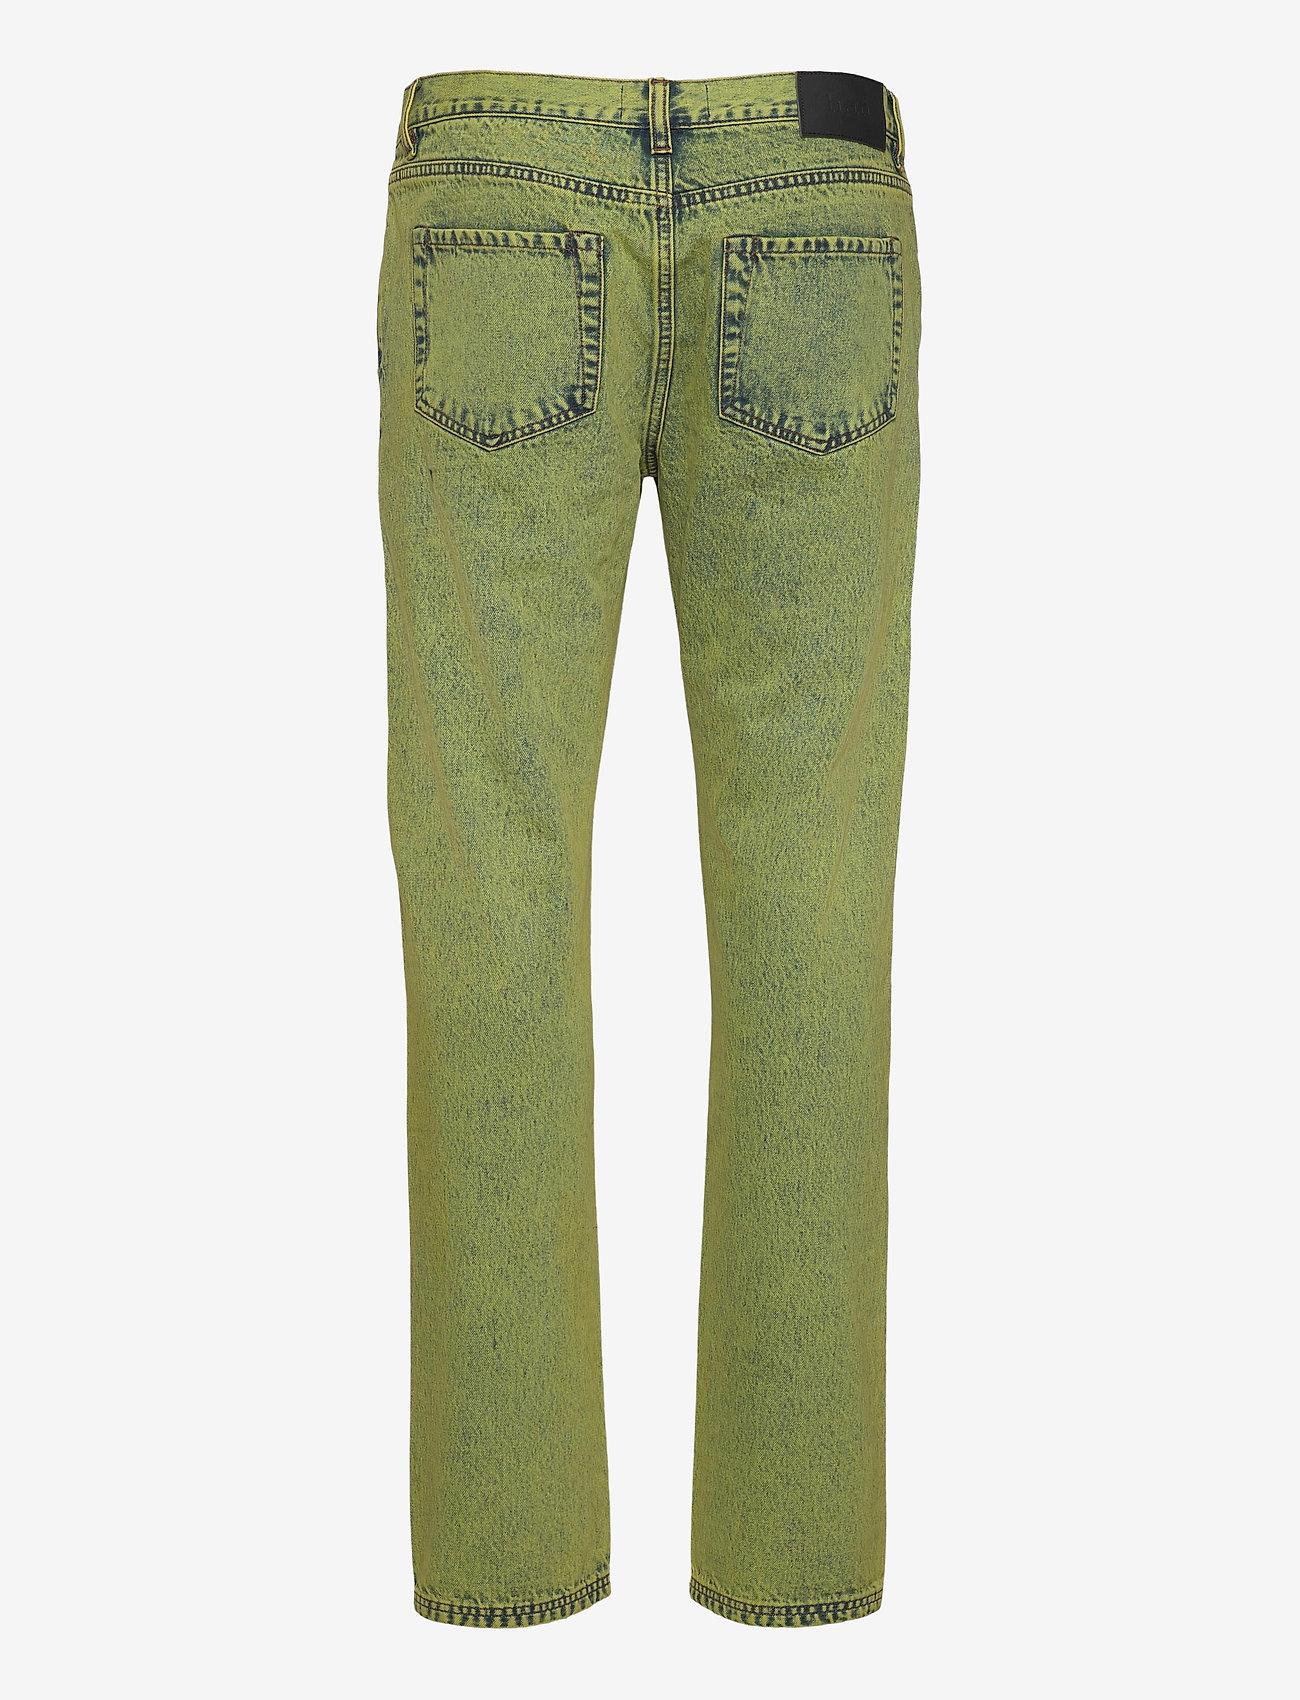 HAN Kjøbenhavn - Denim Jeans - slim jeans - lime - 1